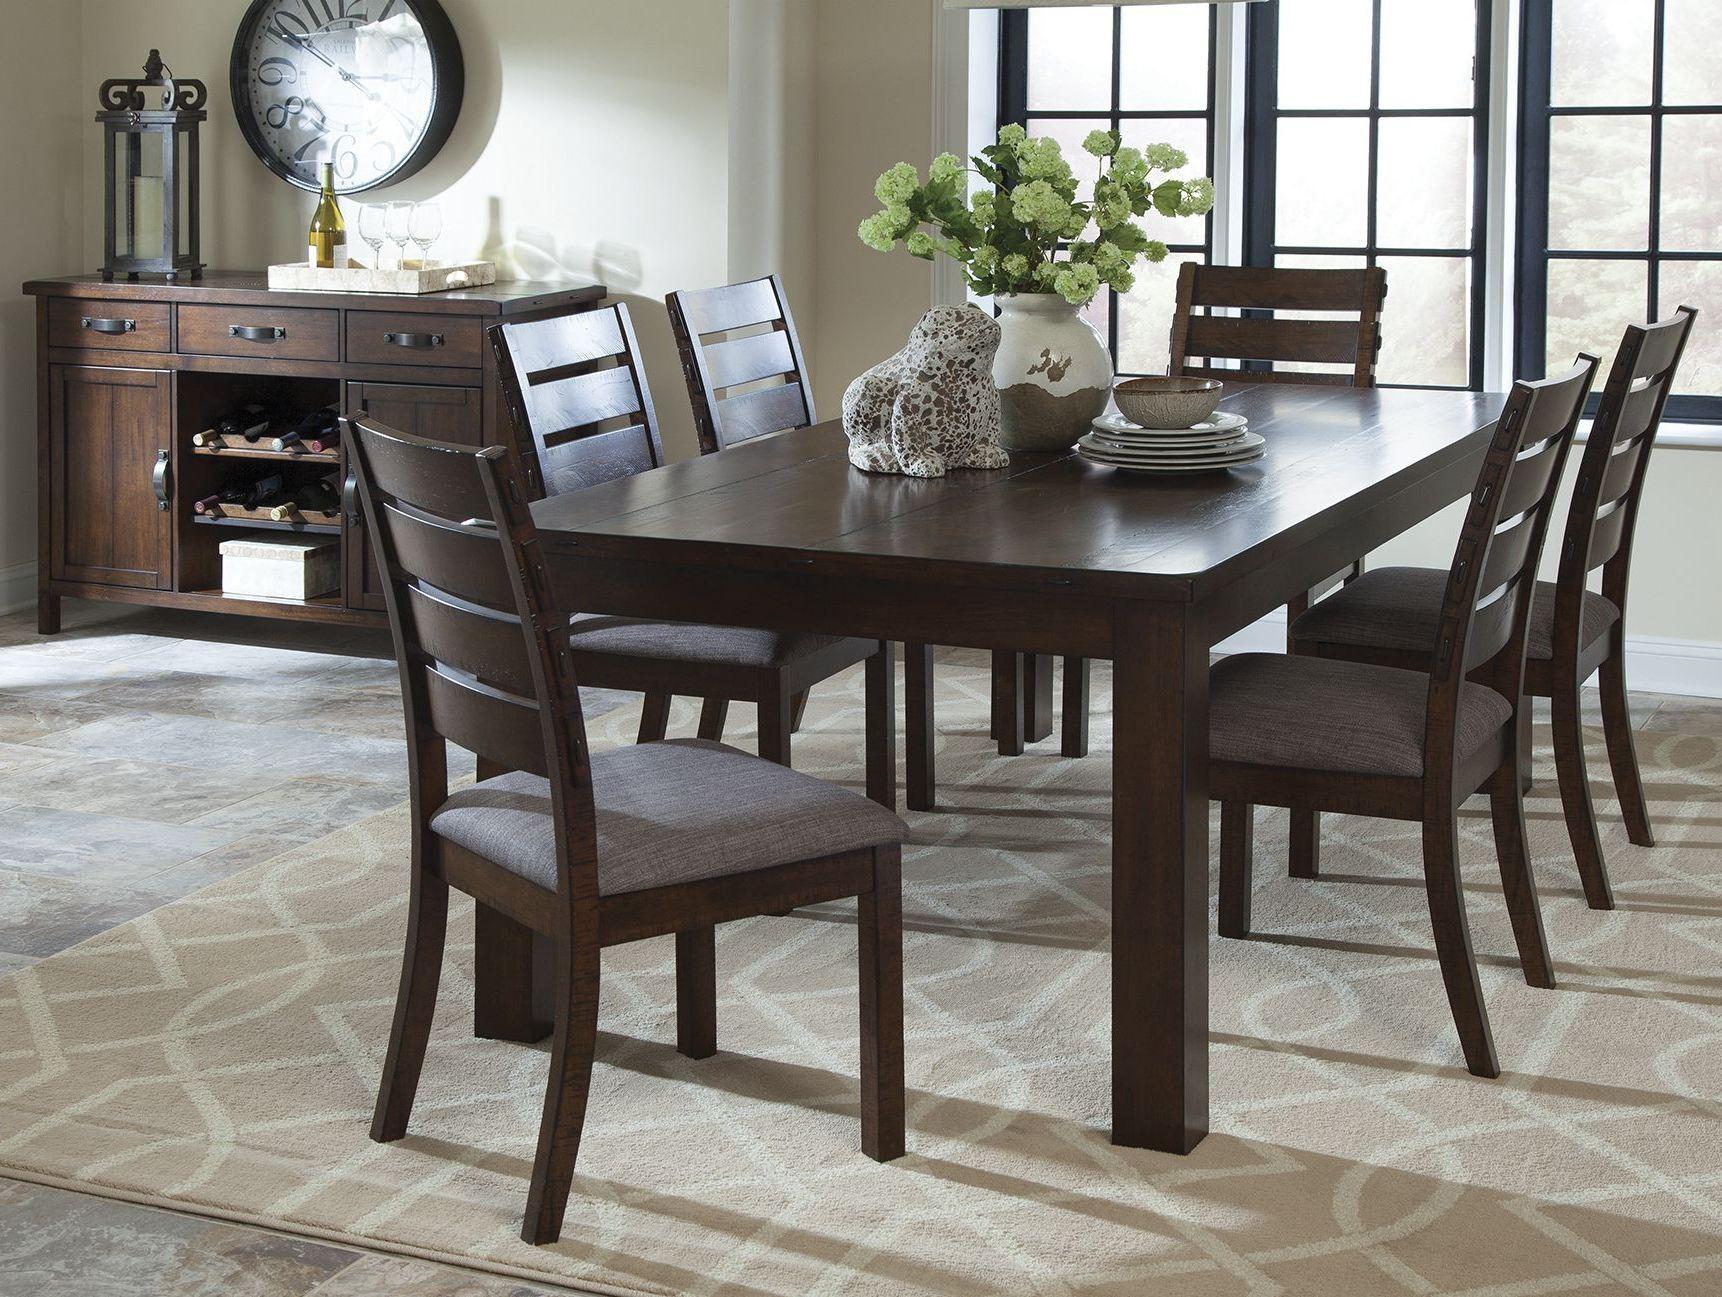 Wiltshire Rustic Pecan Dining Room Set 106361 Coaster Furniture